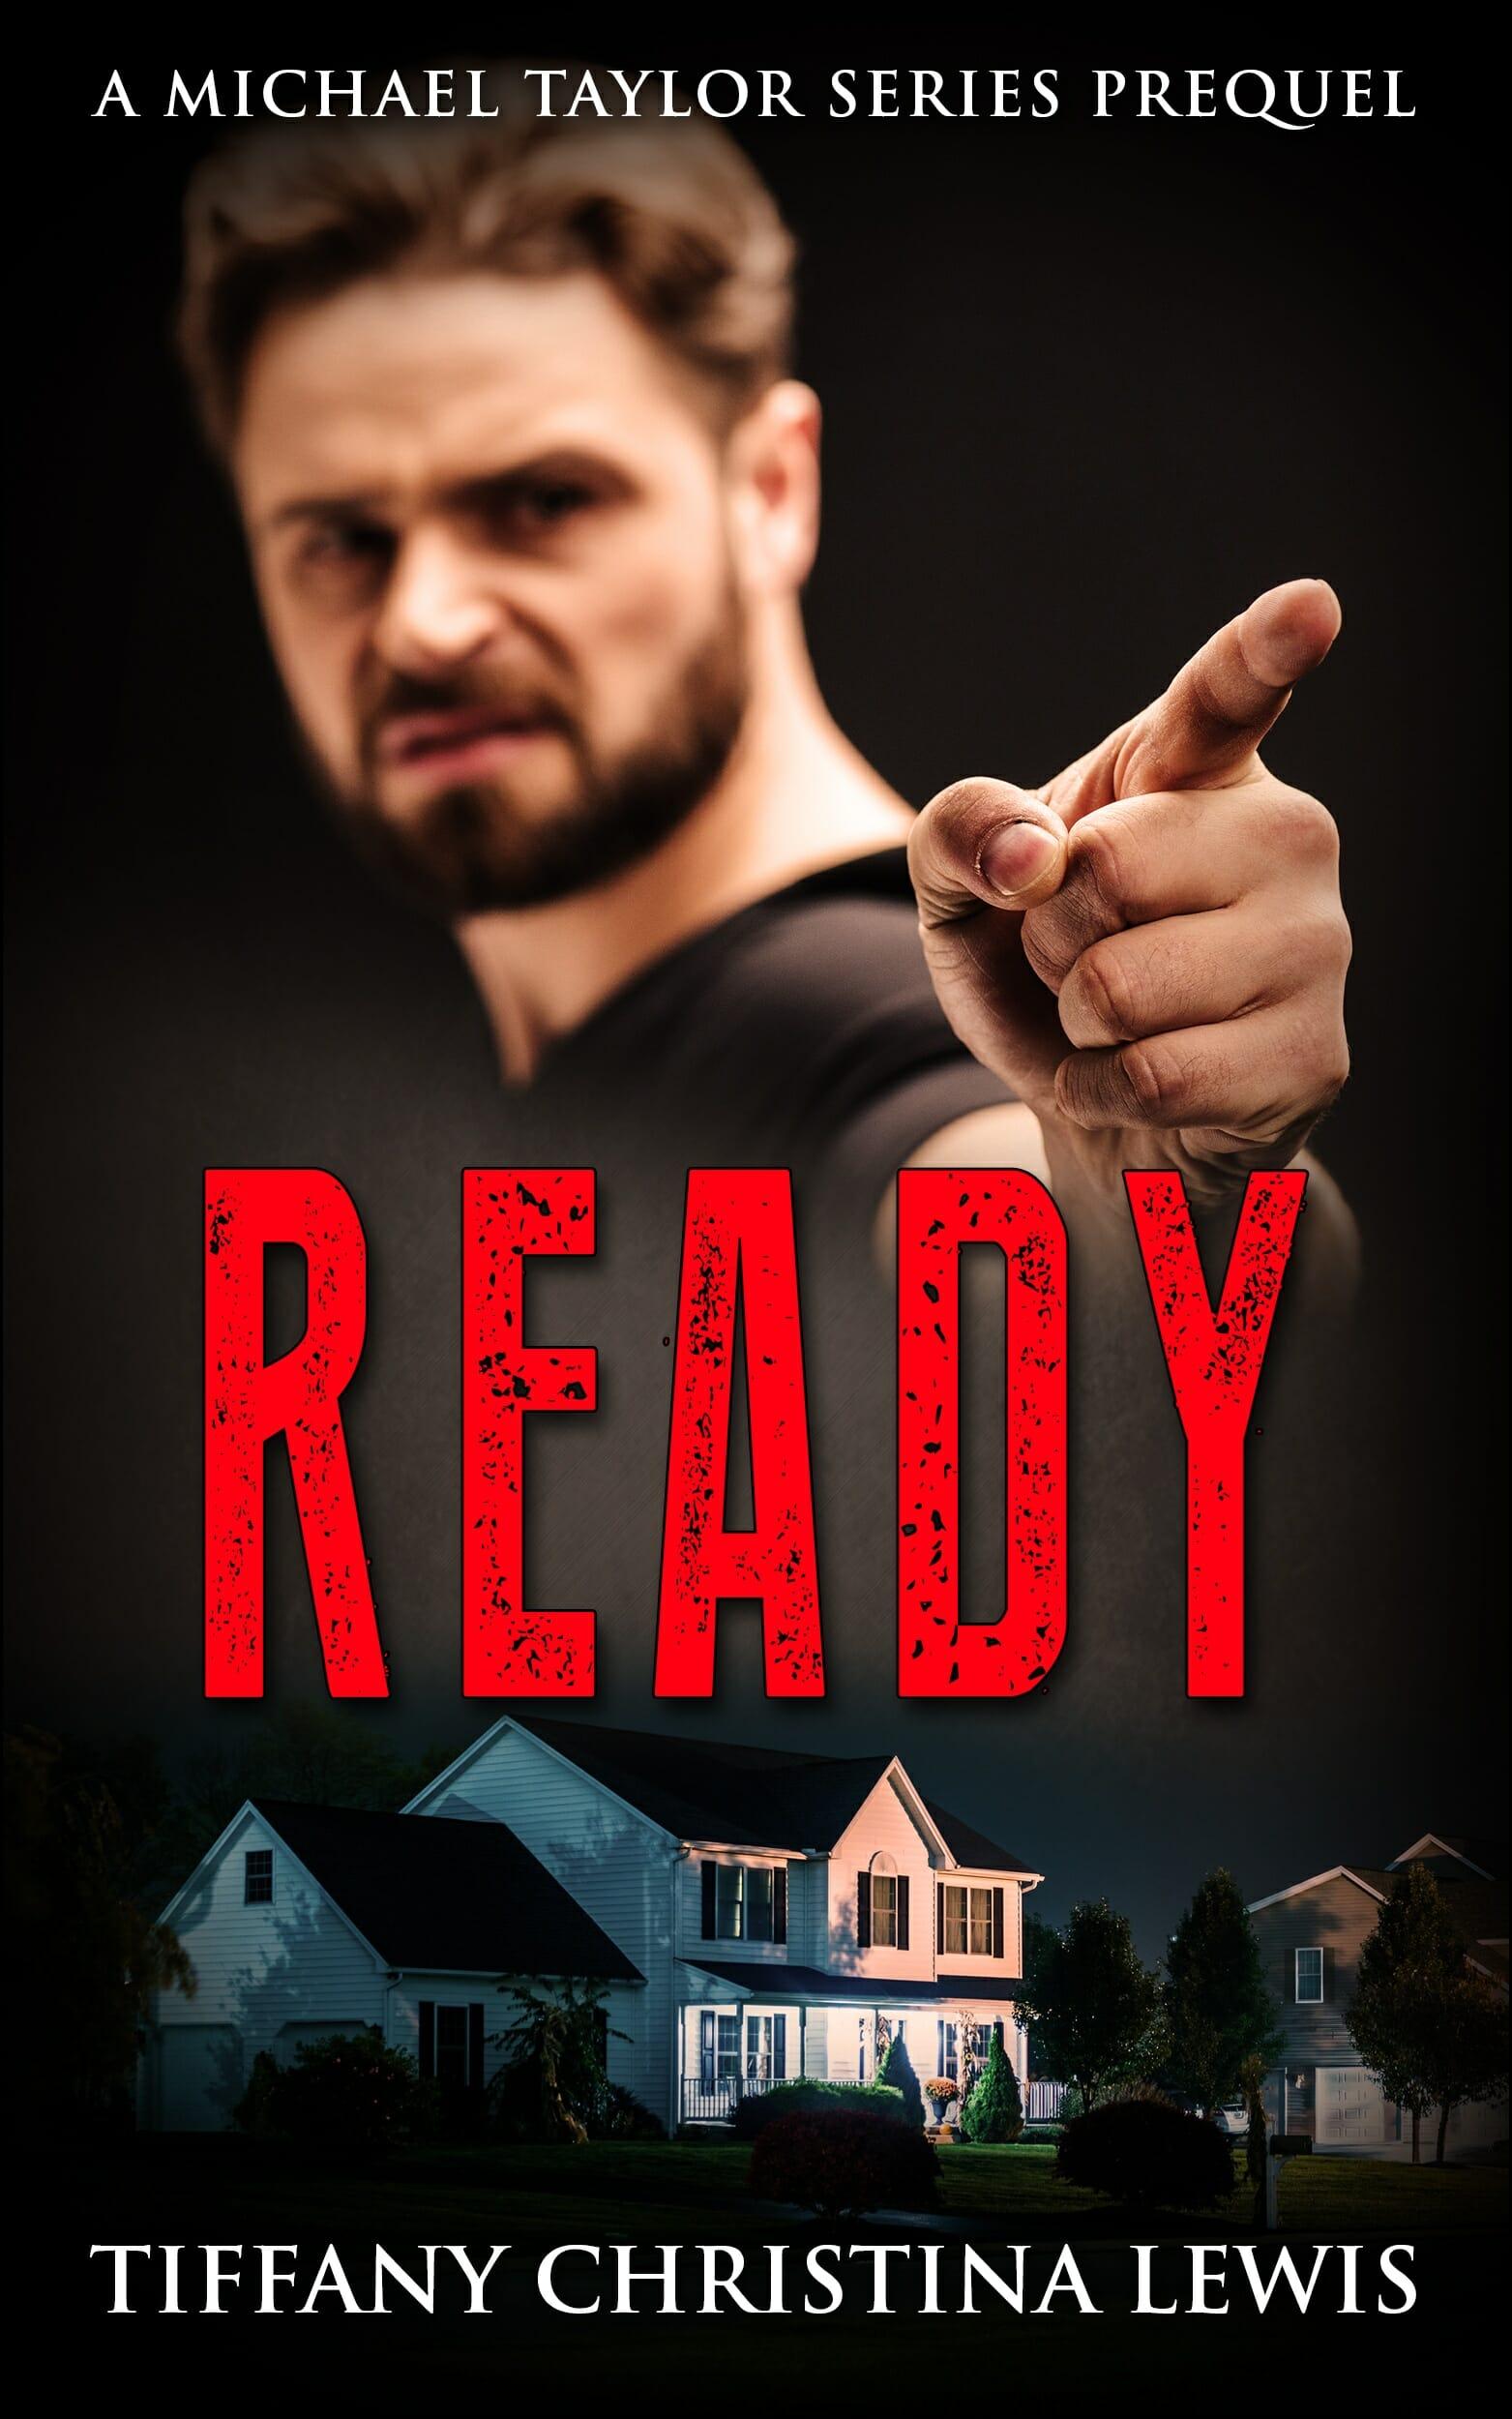 Authorpinky-_ready.jpg